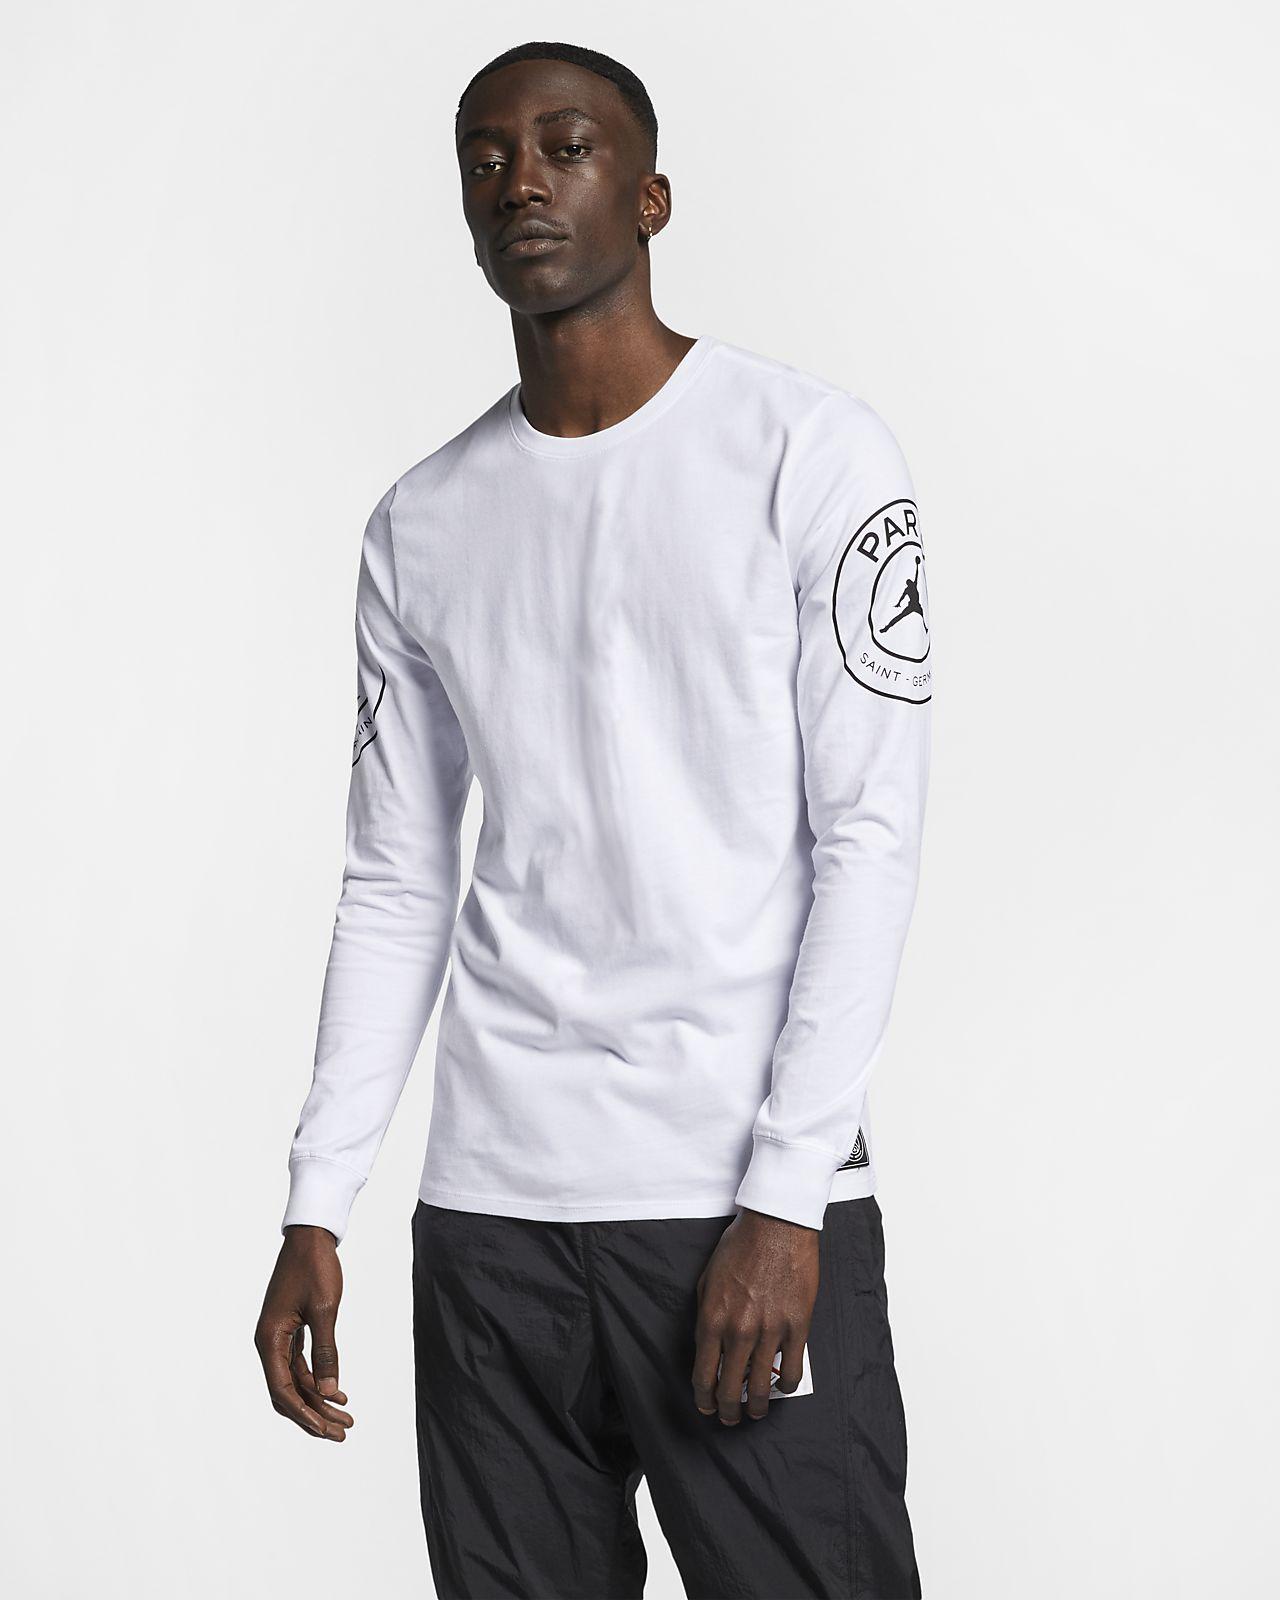 promo code 10025 5ad52 PSG Statement Men s Long-Sleeve T-Shirt. Nike.com AU